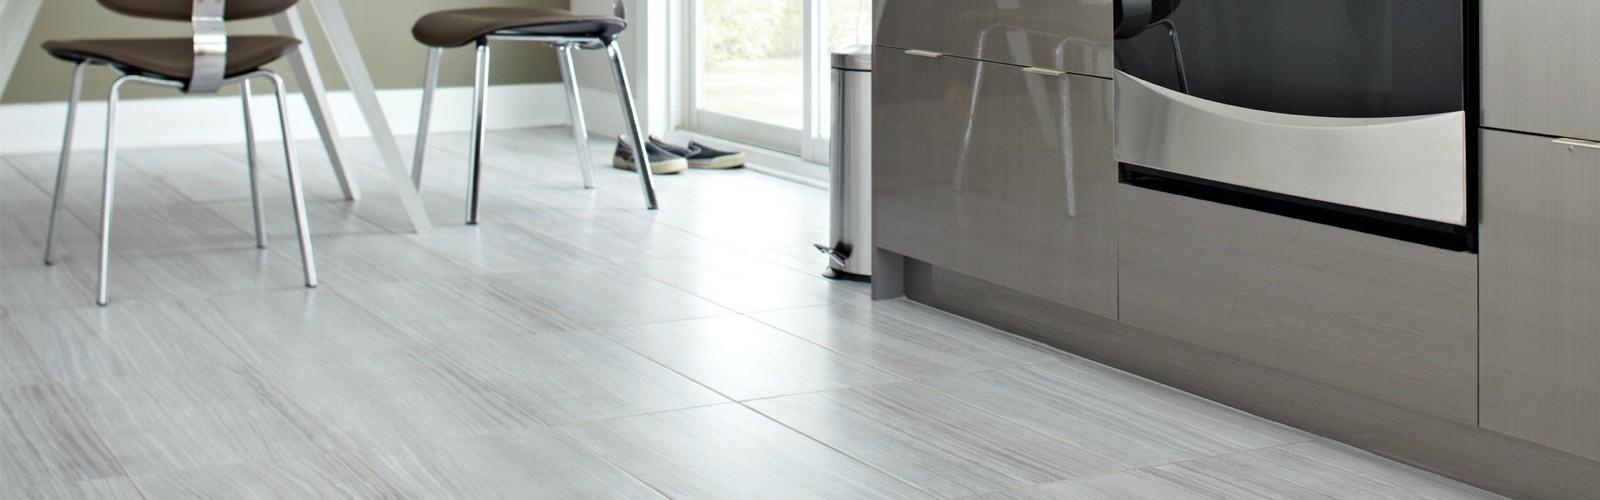 Casaroma Tile | All Floors Design Centre